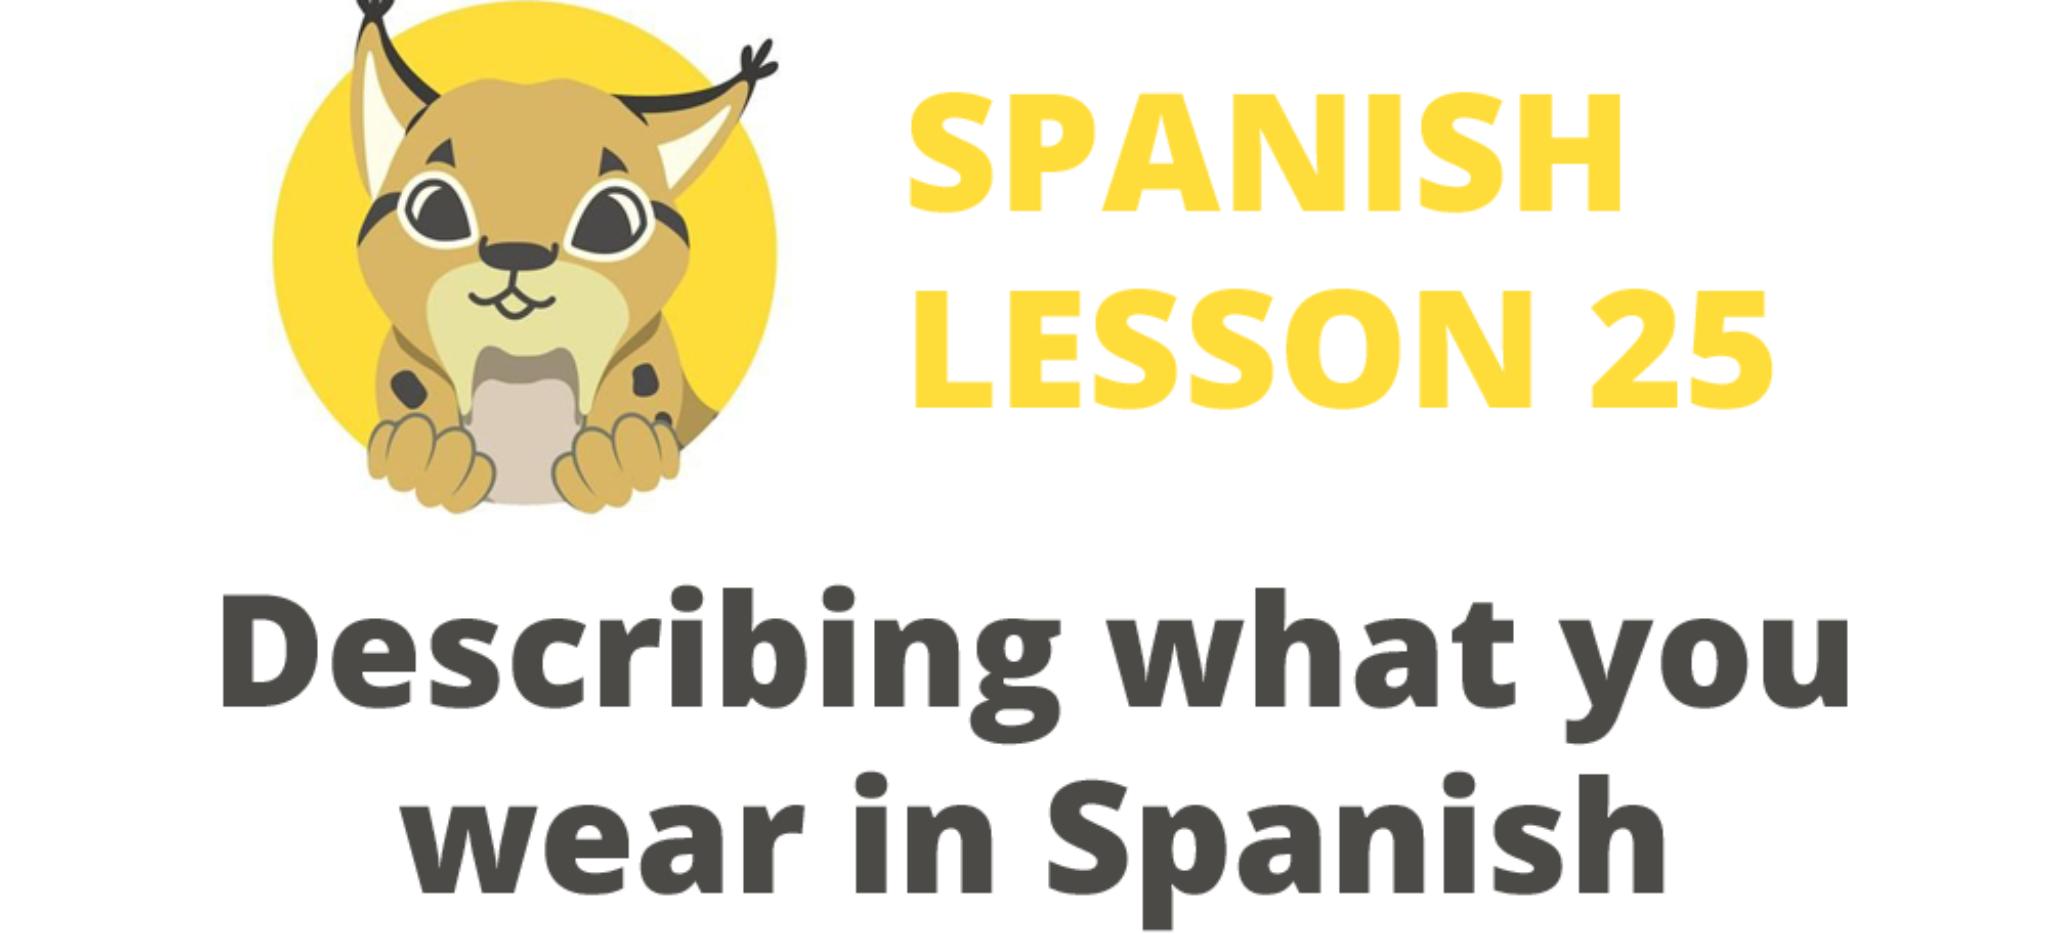 Describing what you wear in Spanish